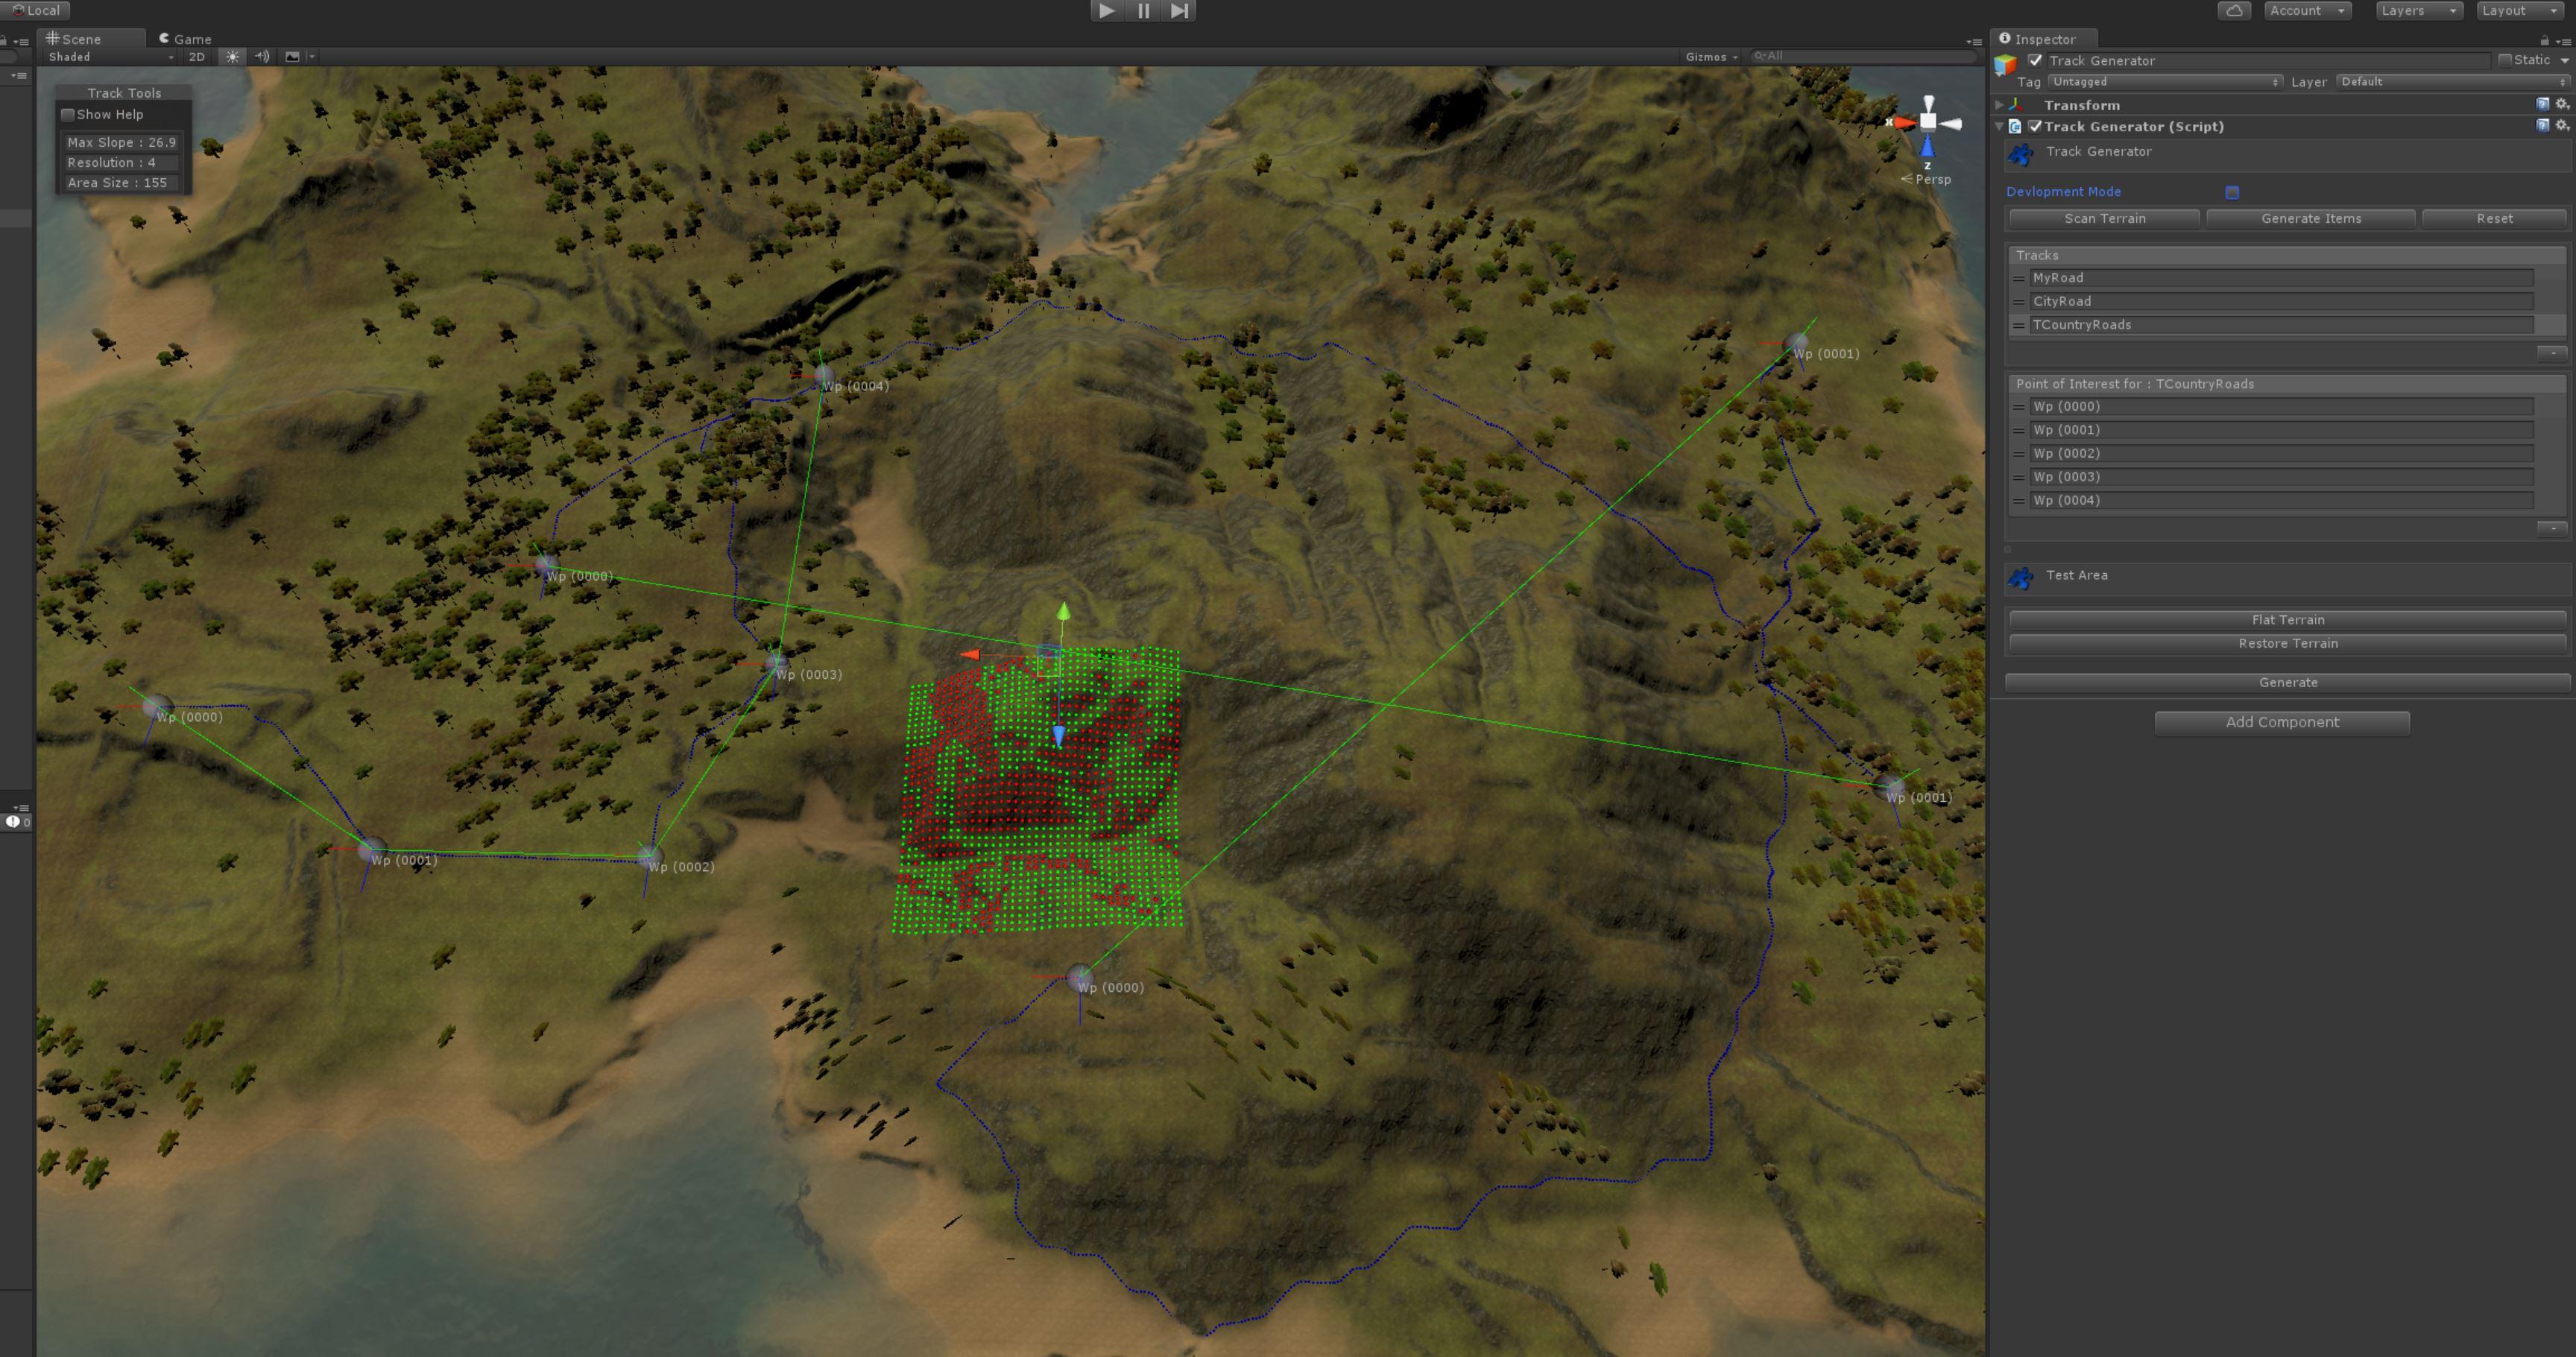 Assets sentieri beta 05 terrain procedural path creator for captureg gumiabroncs Images